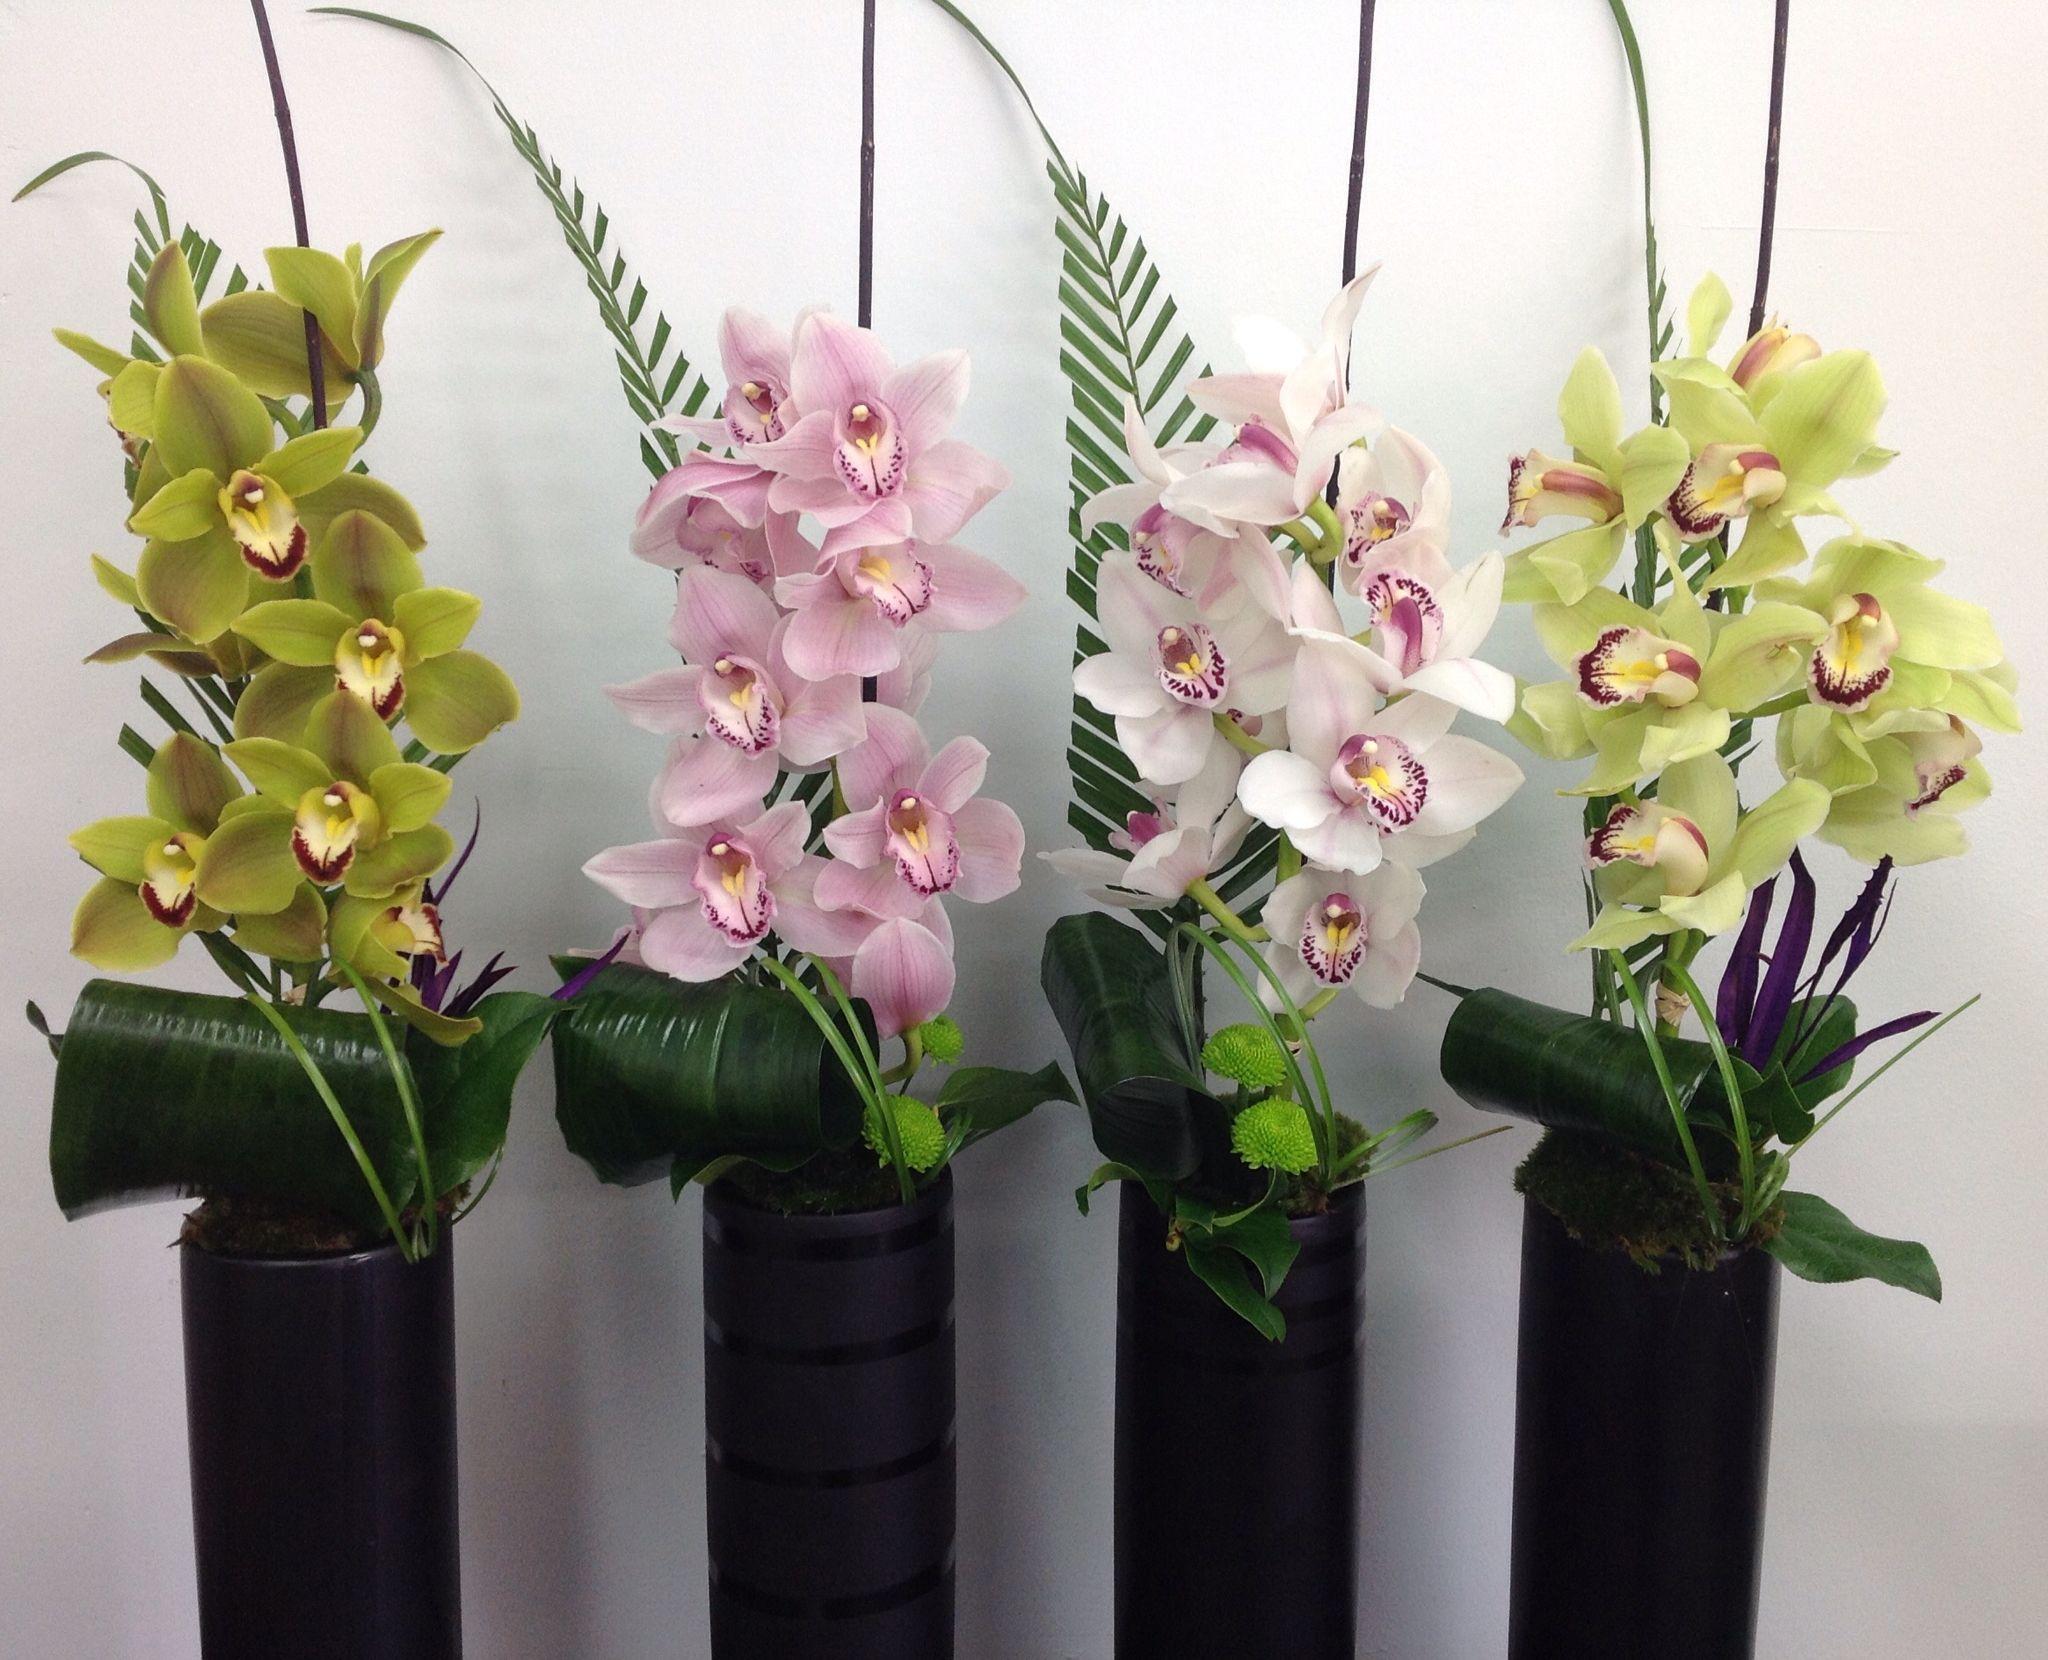 Cymbidium Orchids Corporate Arrangements Flower Arrangements Floral Arrangements Flower Room